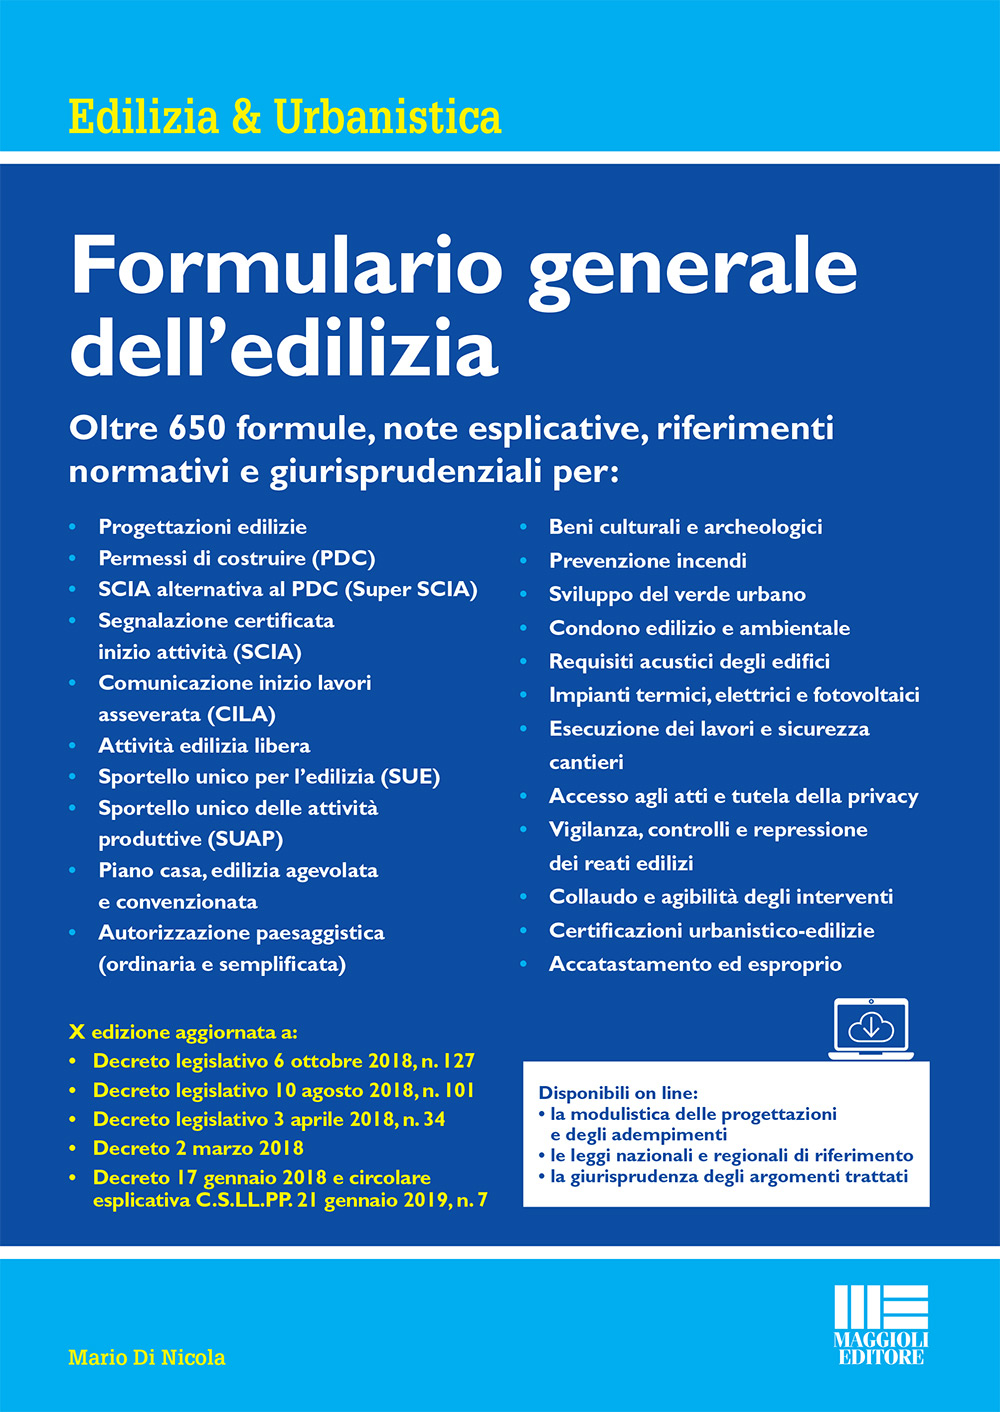 Formulario generale dell'edilizia - Libro carta